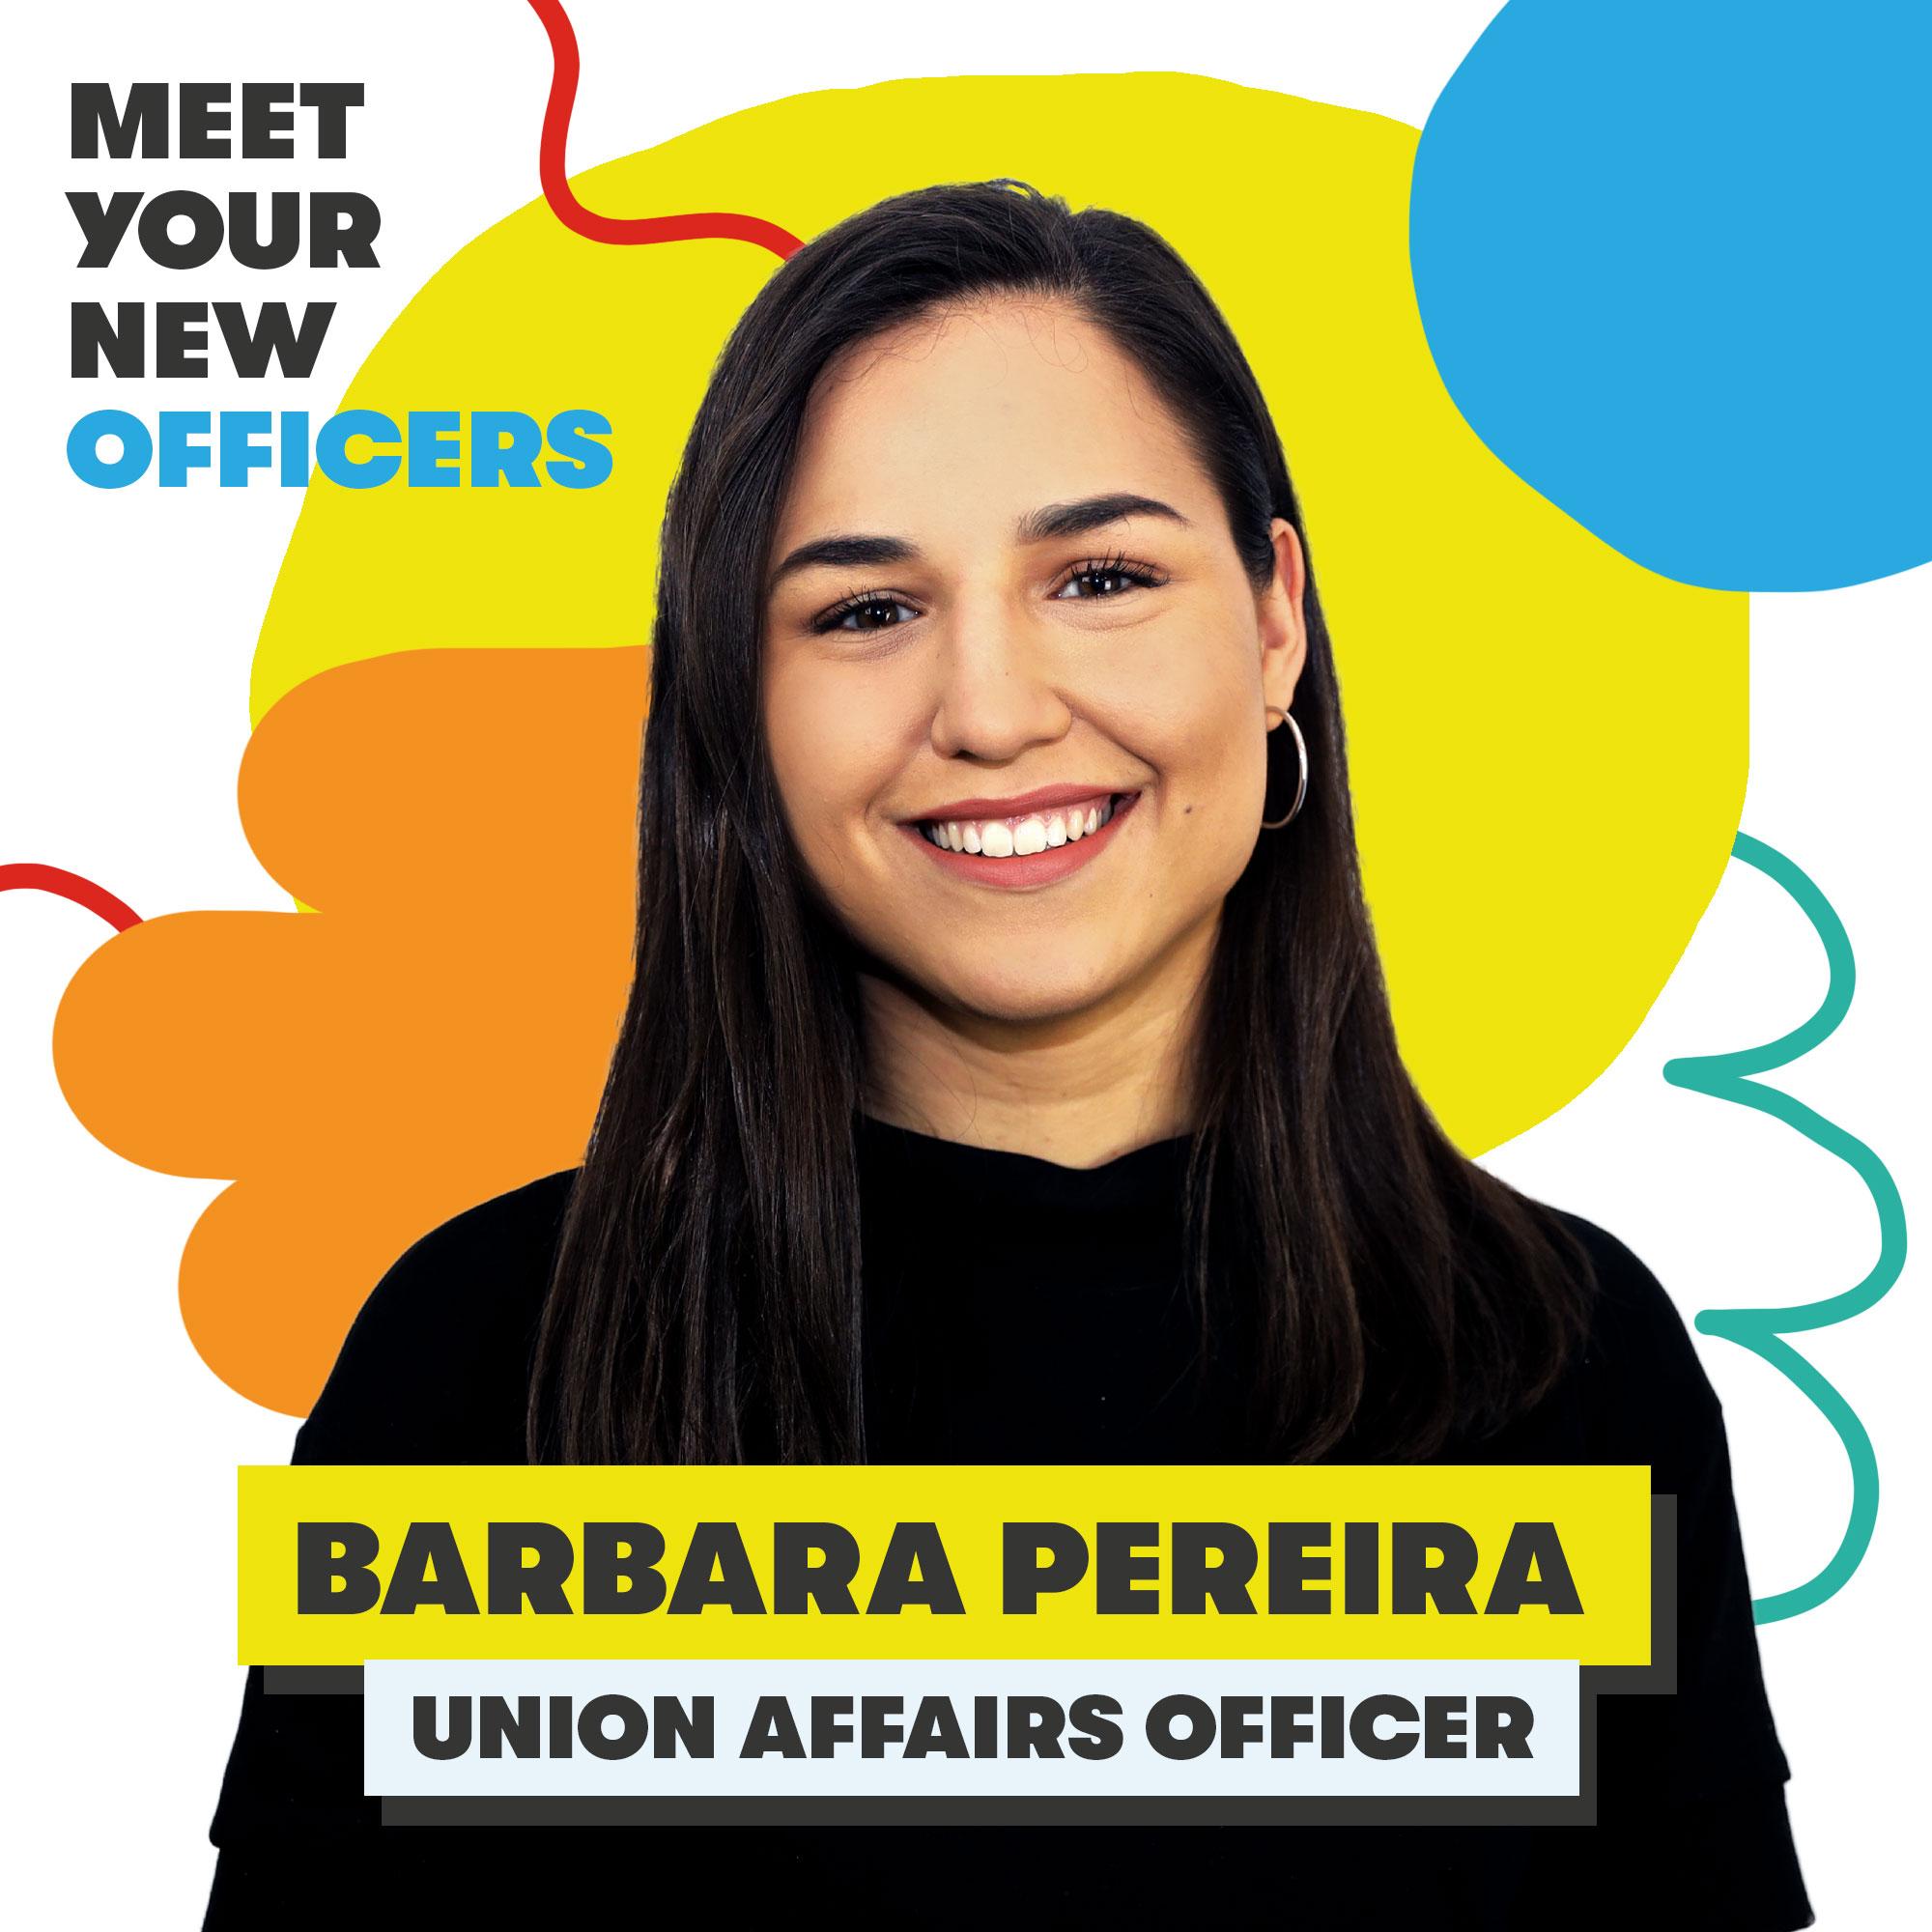 Barbara Pereira